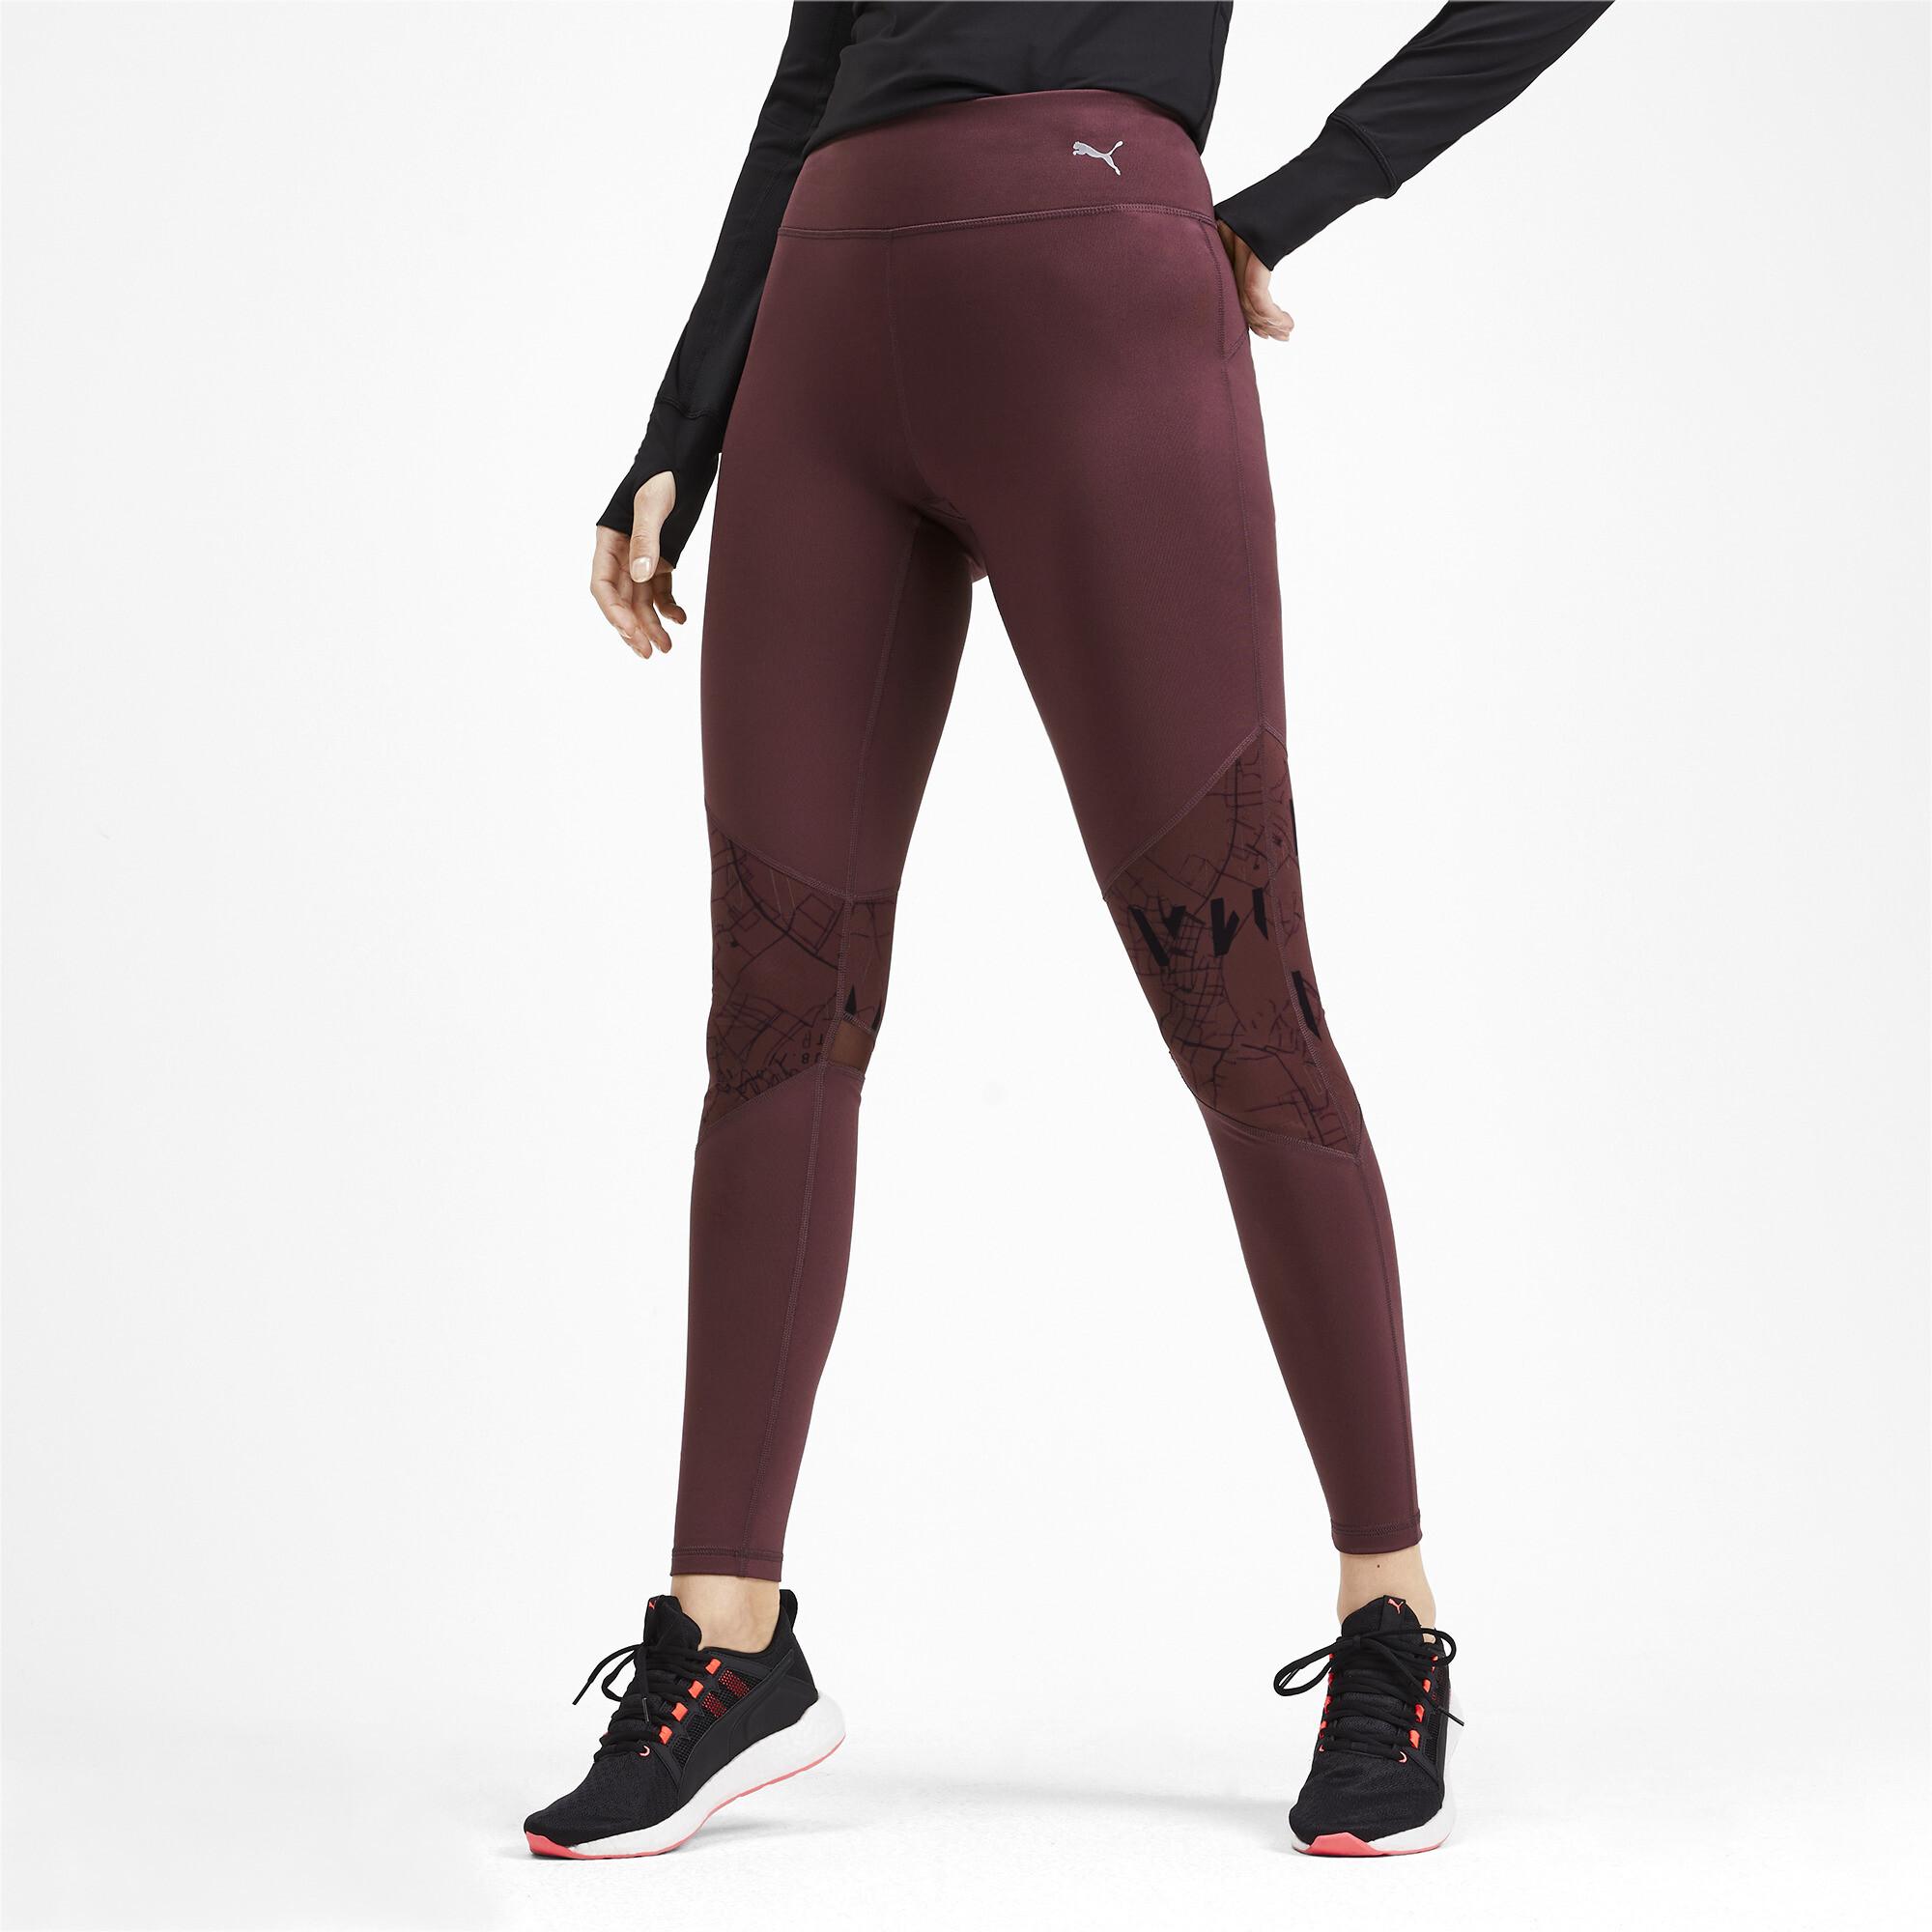 PUMA-Graphic-Women-039-s-Leggings-Girls-Running thumbnail 9